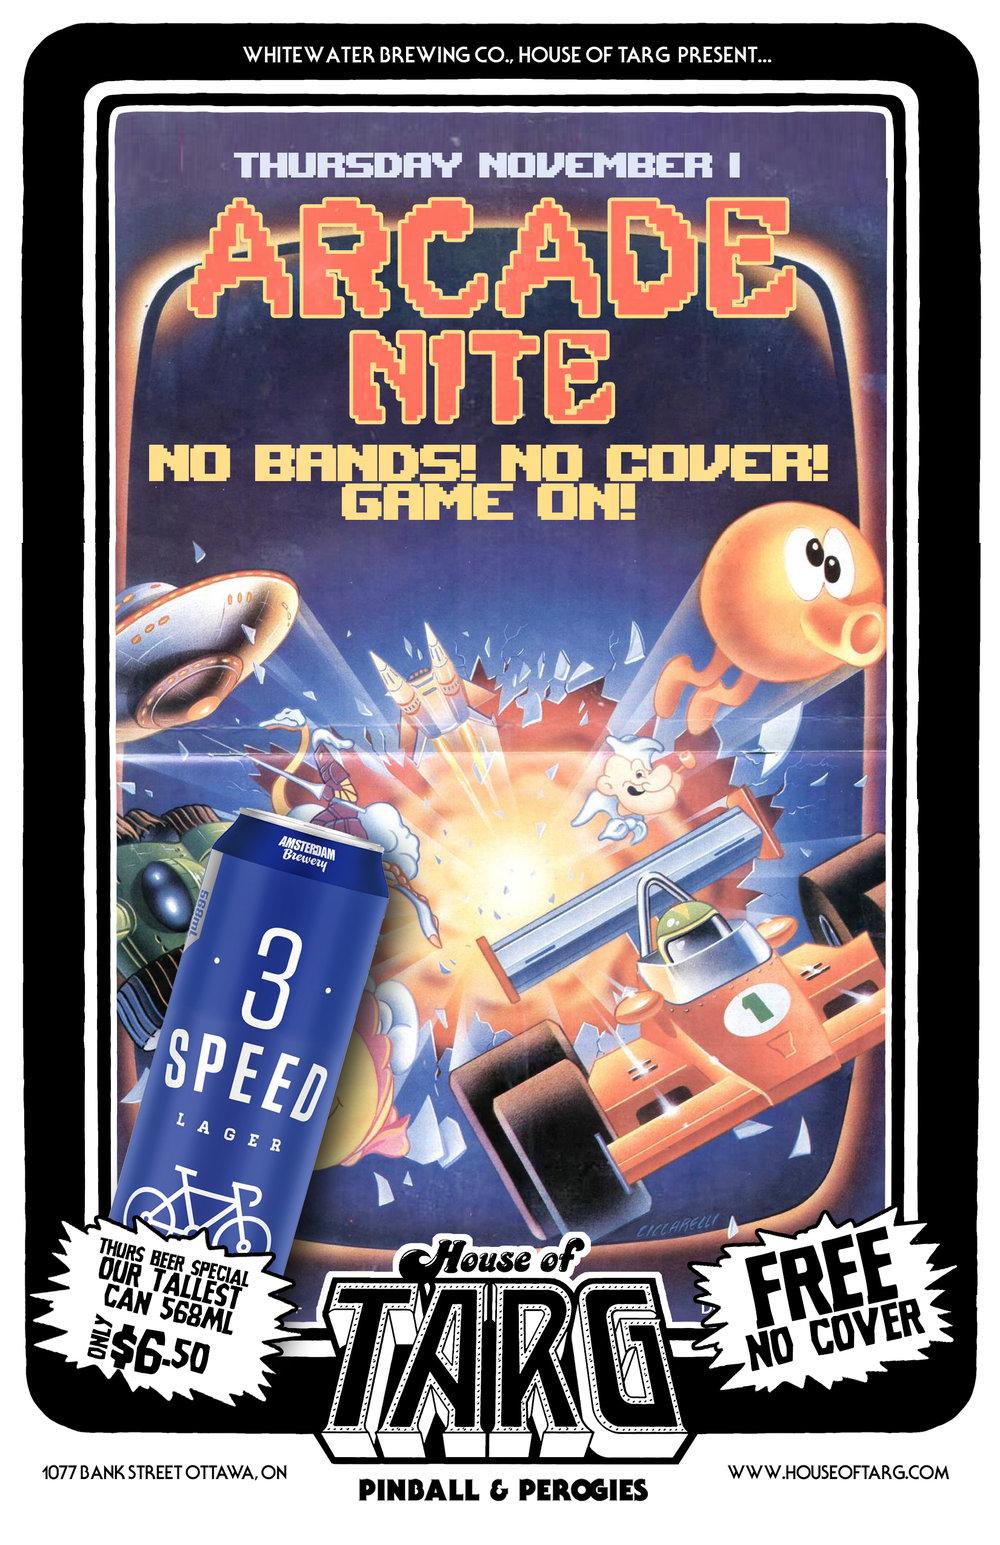 Arcade Nite Thurs NOV 1.jpg